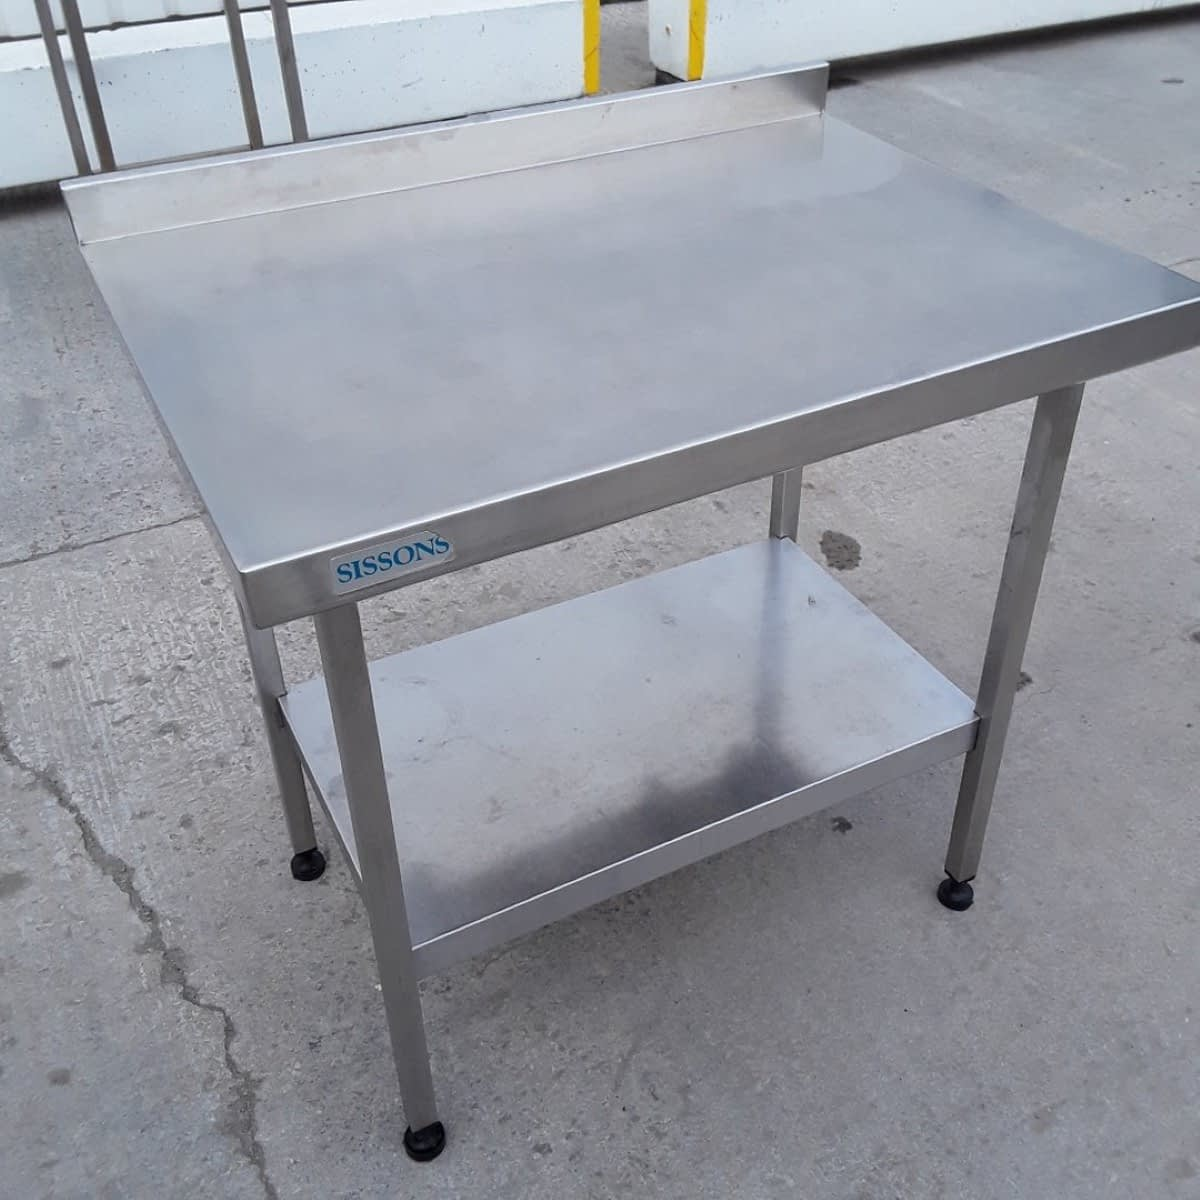 Used Sissons Stainless Steel Table (10322) – Bridgwater, Somerset